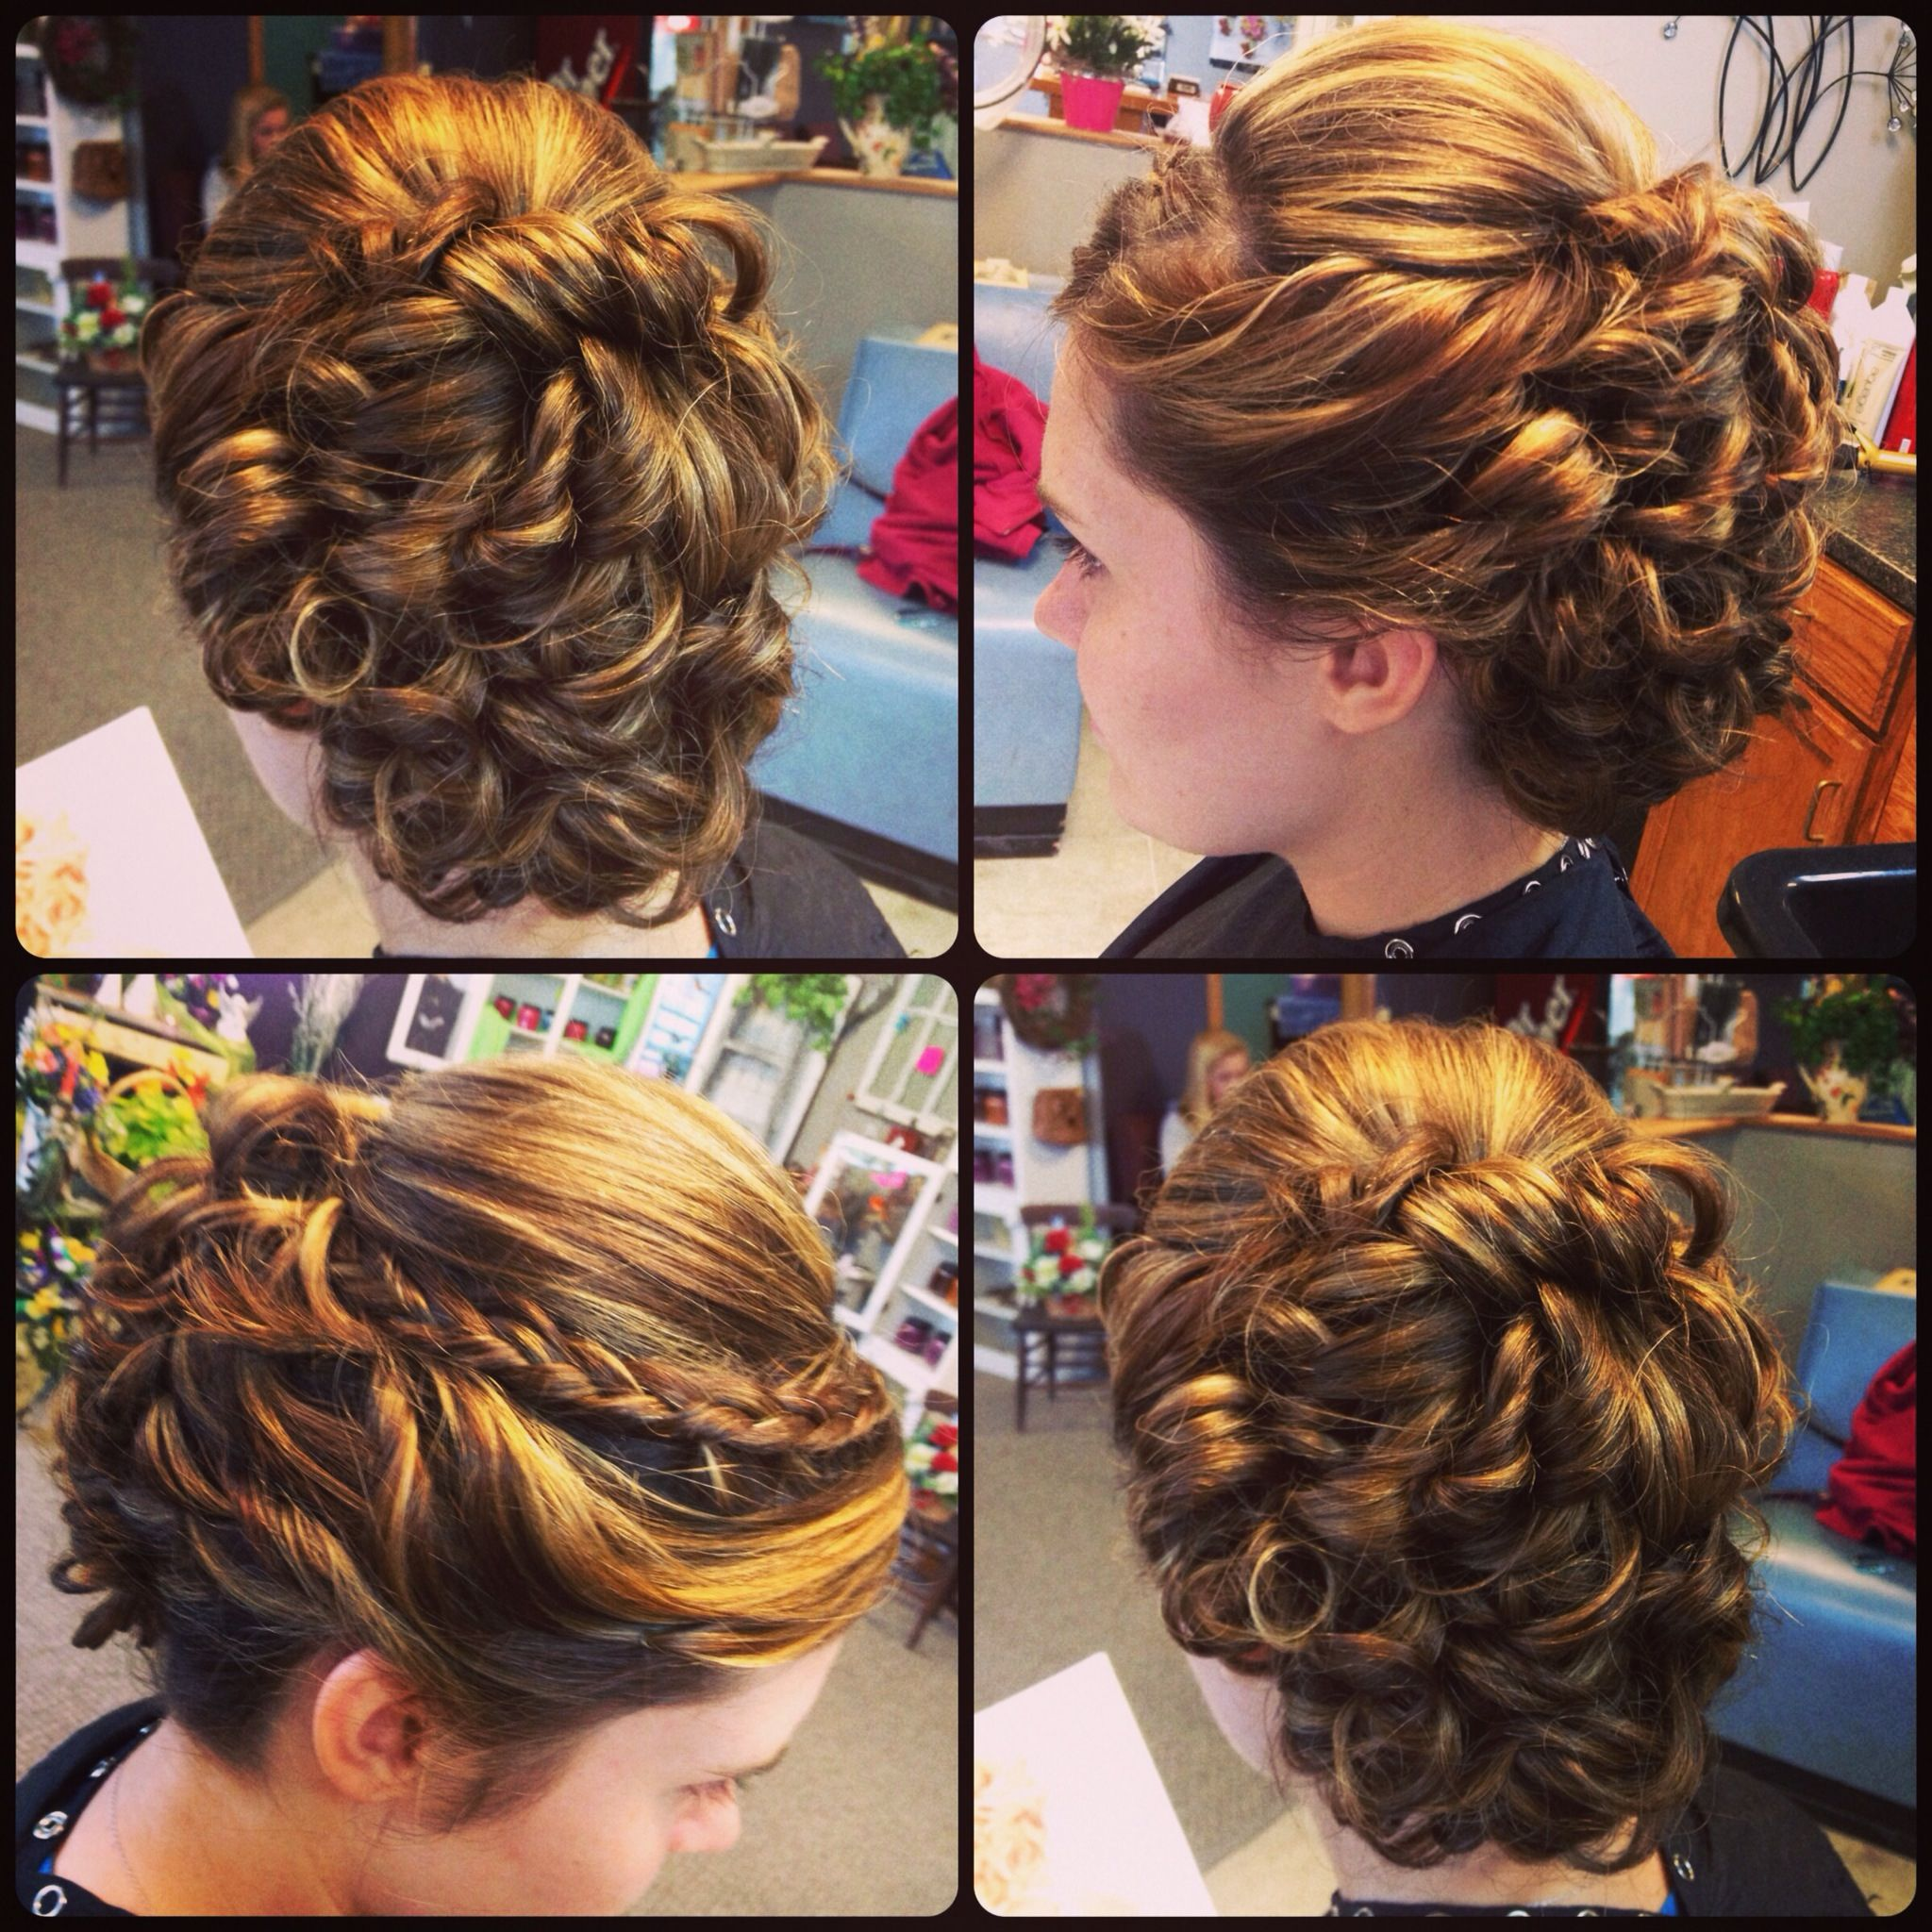 Wedding Hairstyles Brunette: Hair Updo Upstyle Curled Curls Brunette Braid Prom Wedding